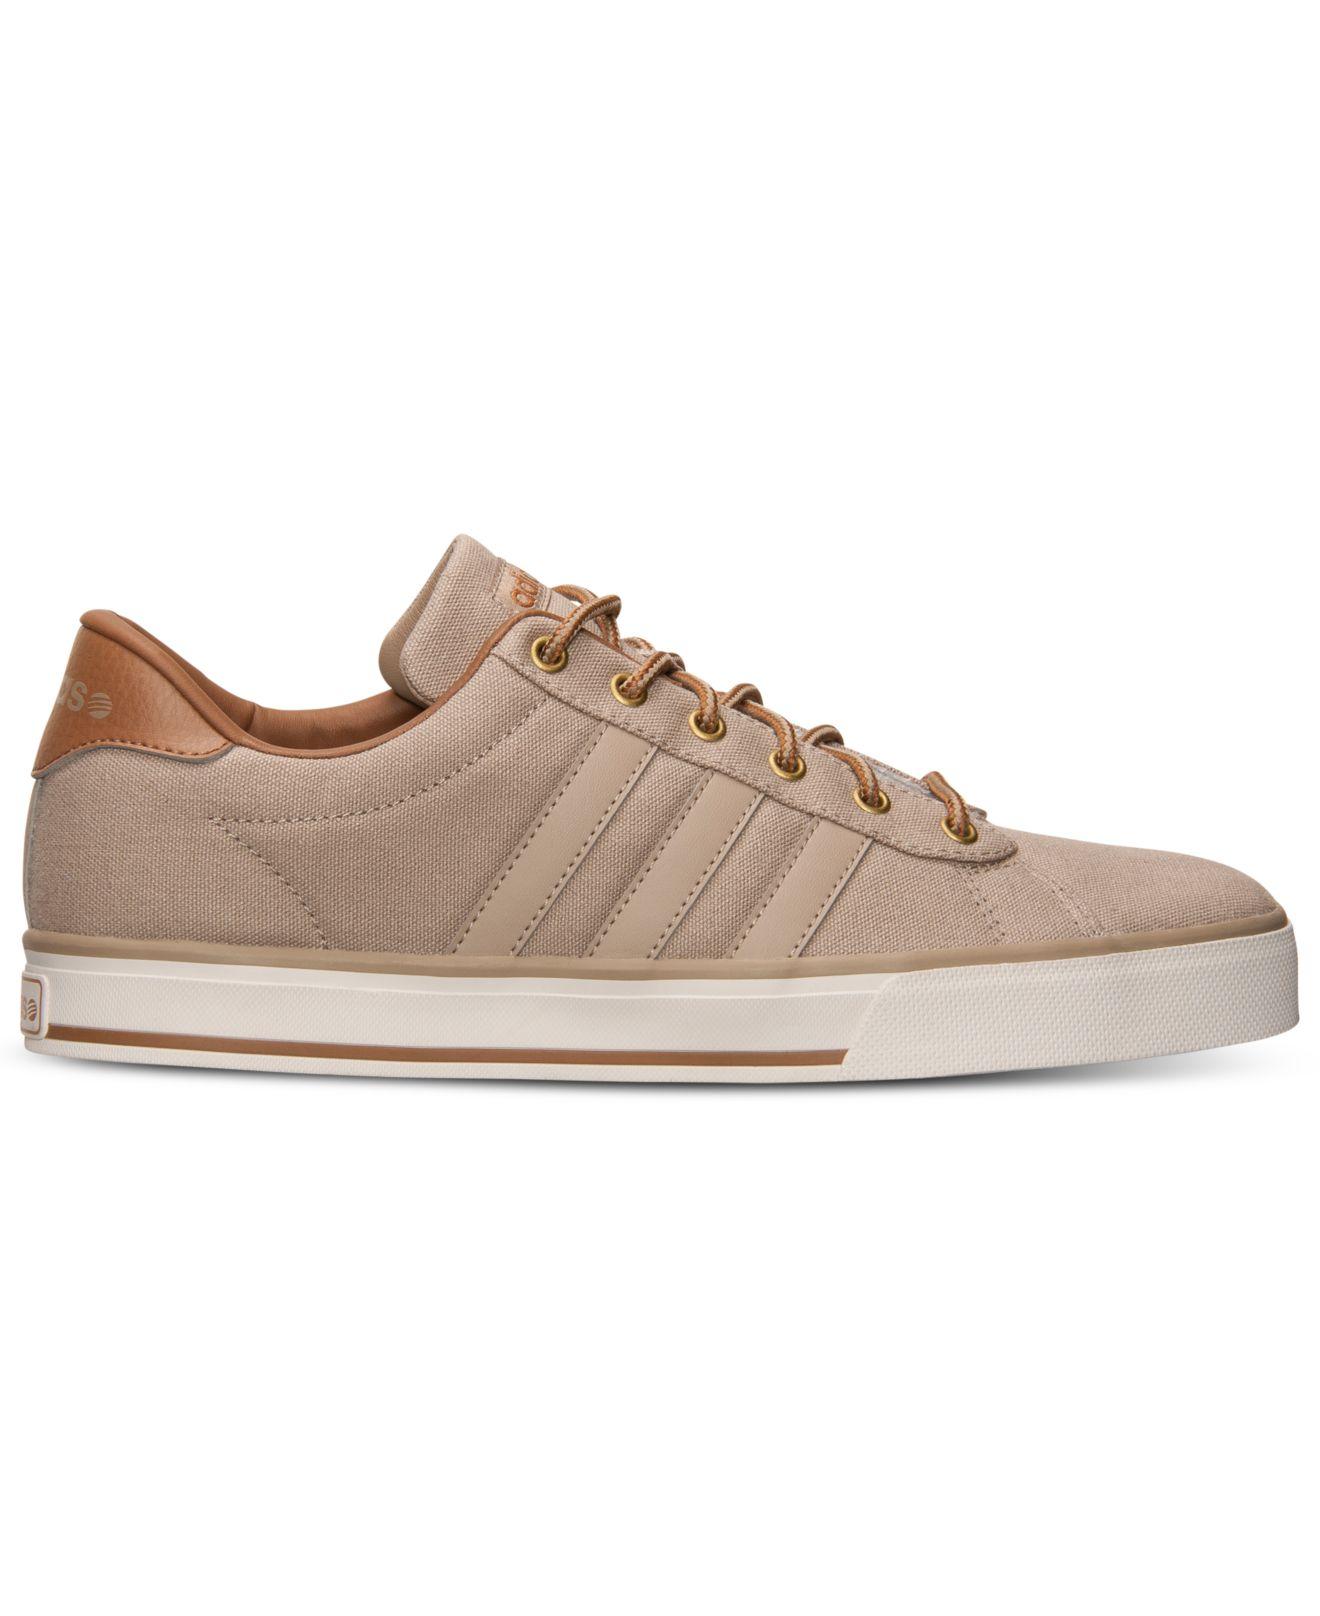 Adidas NEO Daily Vulc beige